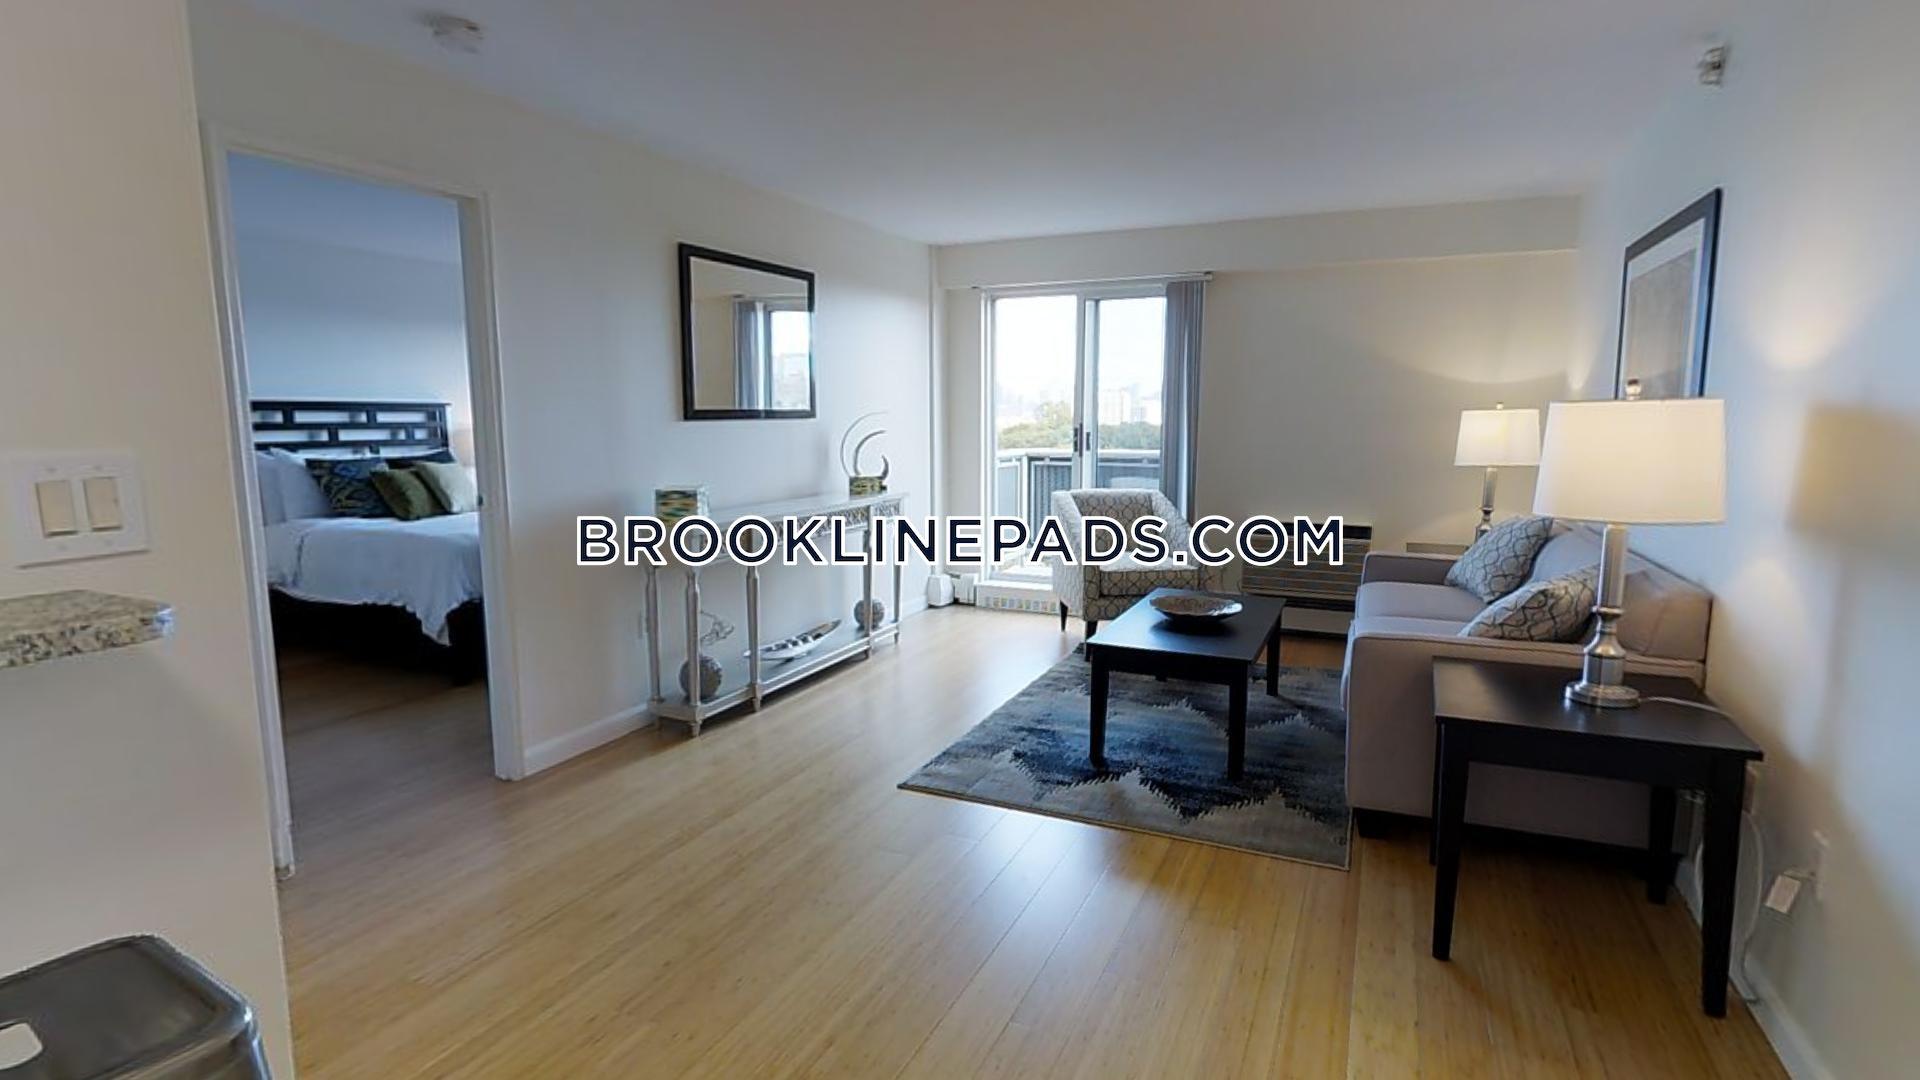 Brookline Apartment For Rent 2 Bedrooms 1 5 Baths Boston University 2 650